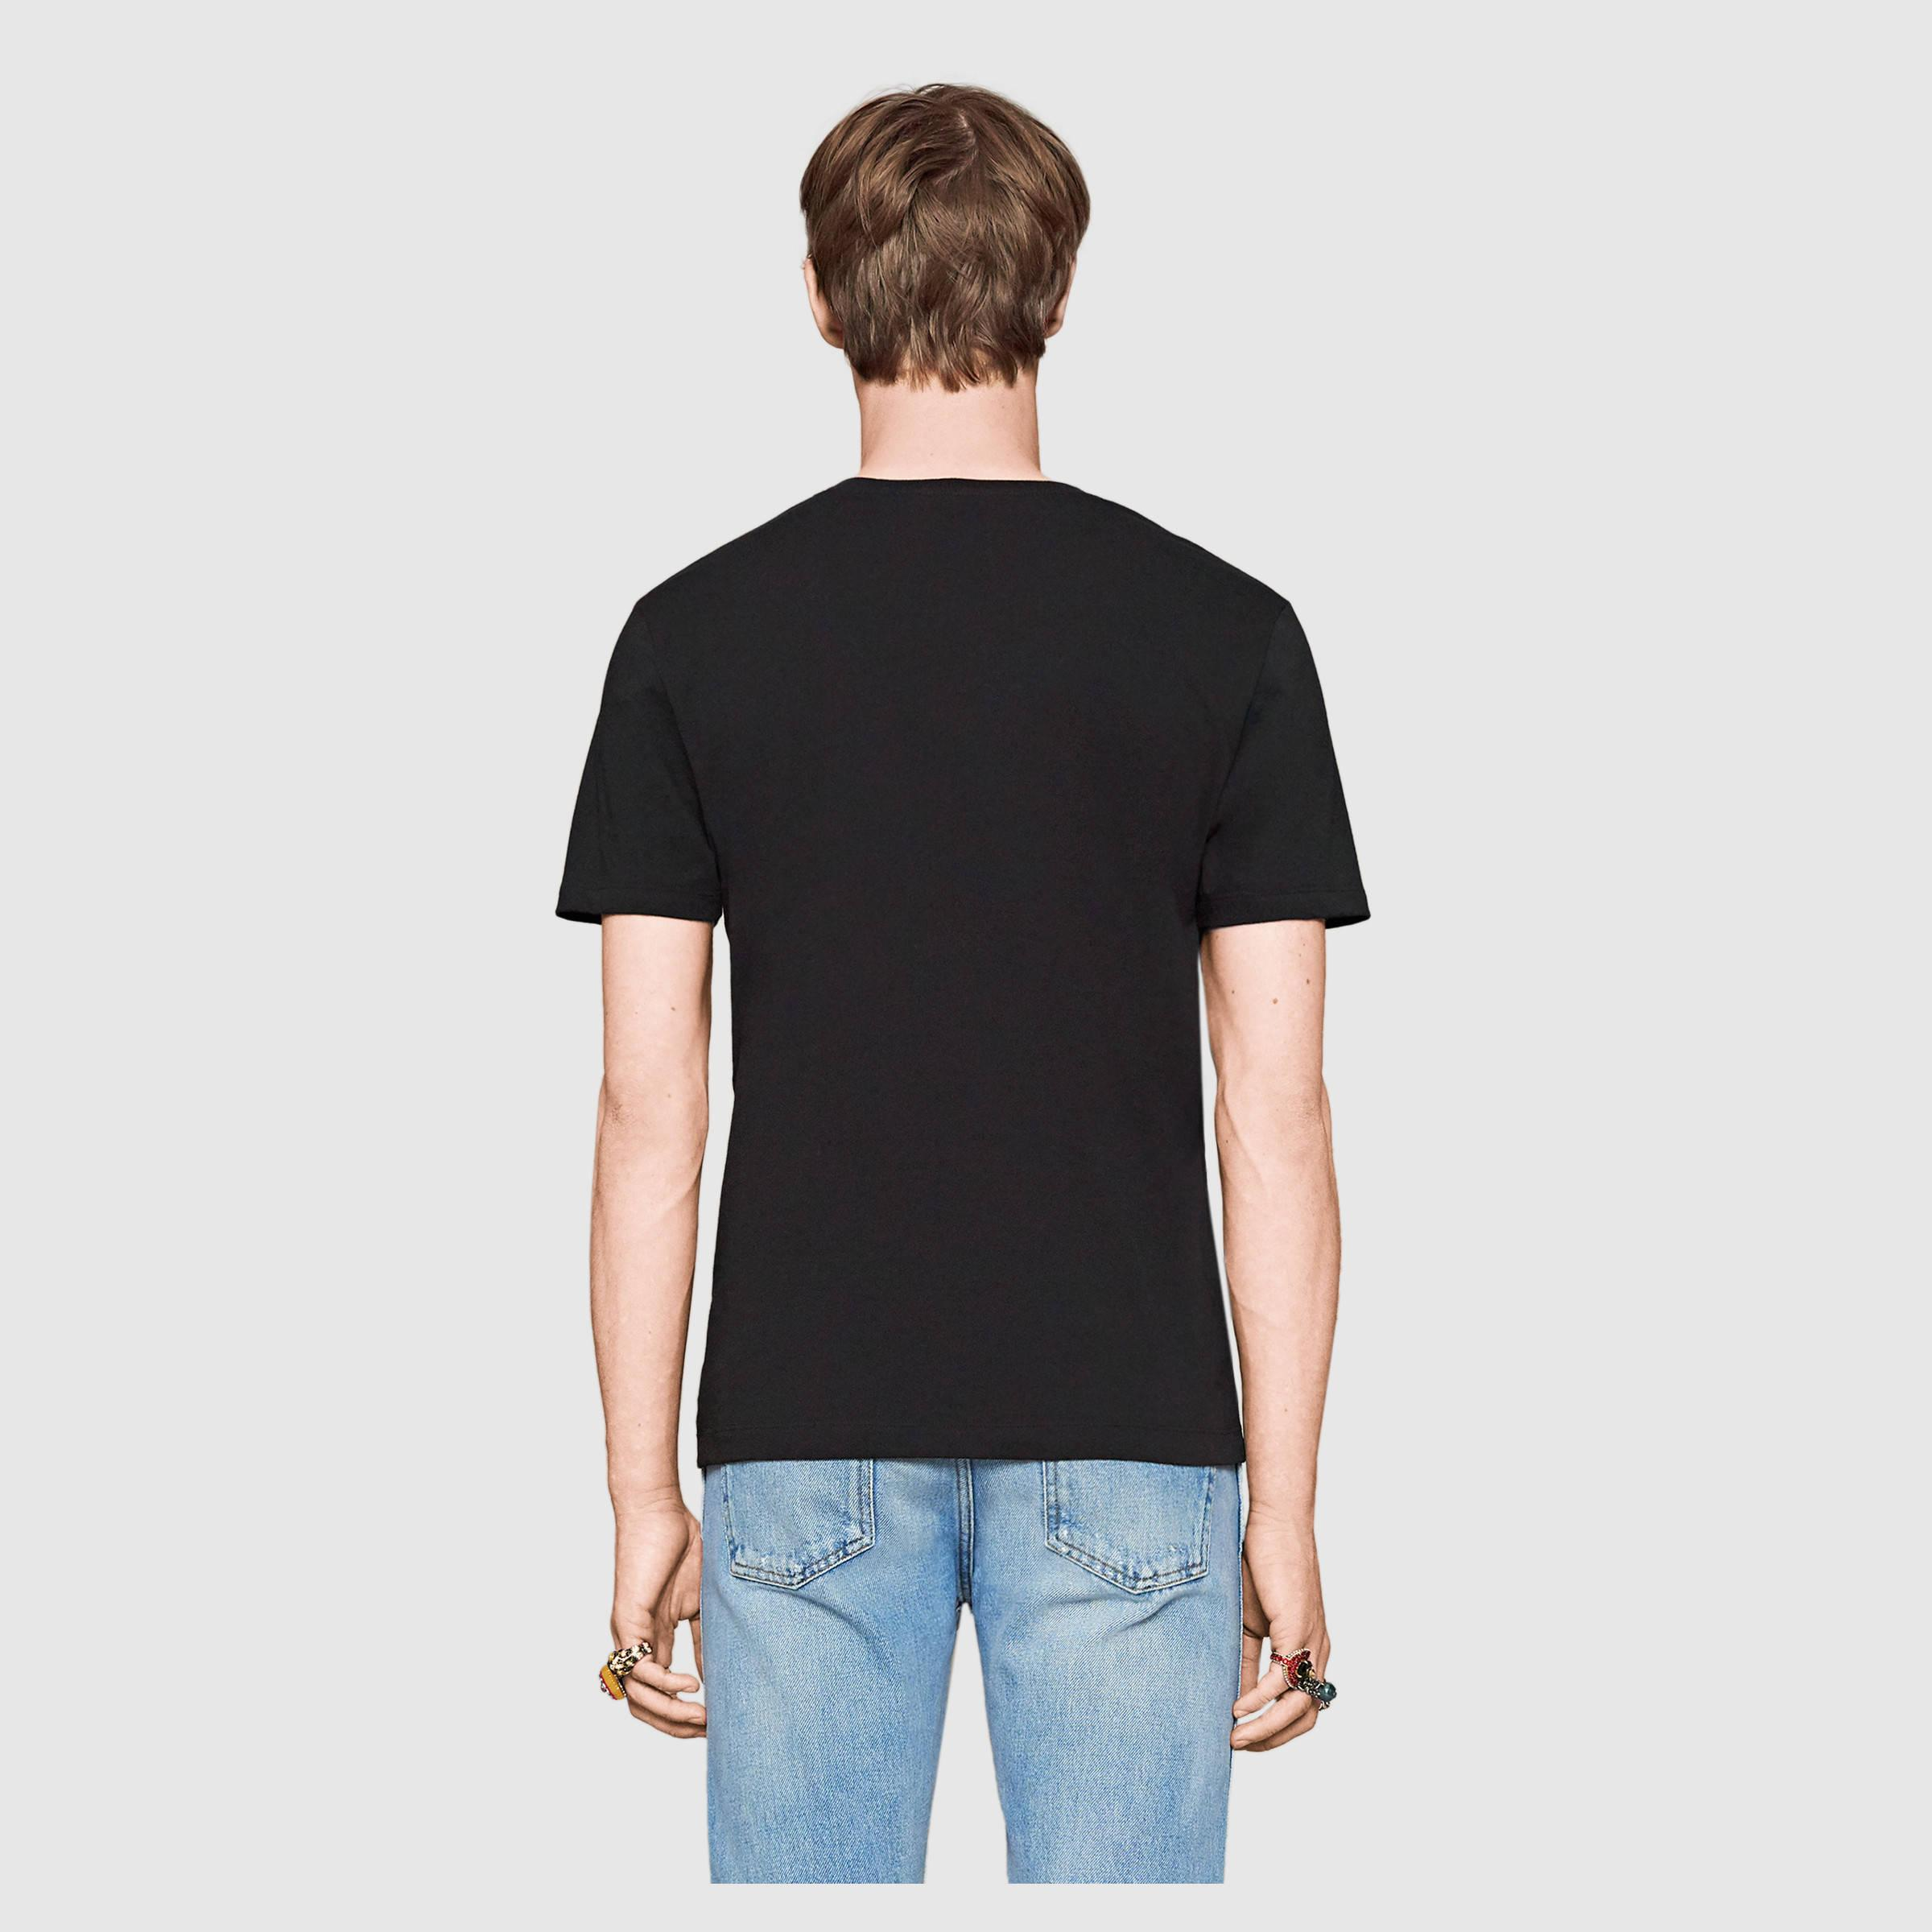 gucci ghost cotton t shirt in black for men lyst. Black Bedroom Furniture Sets. Home Design Ideas